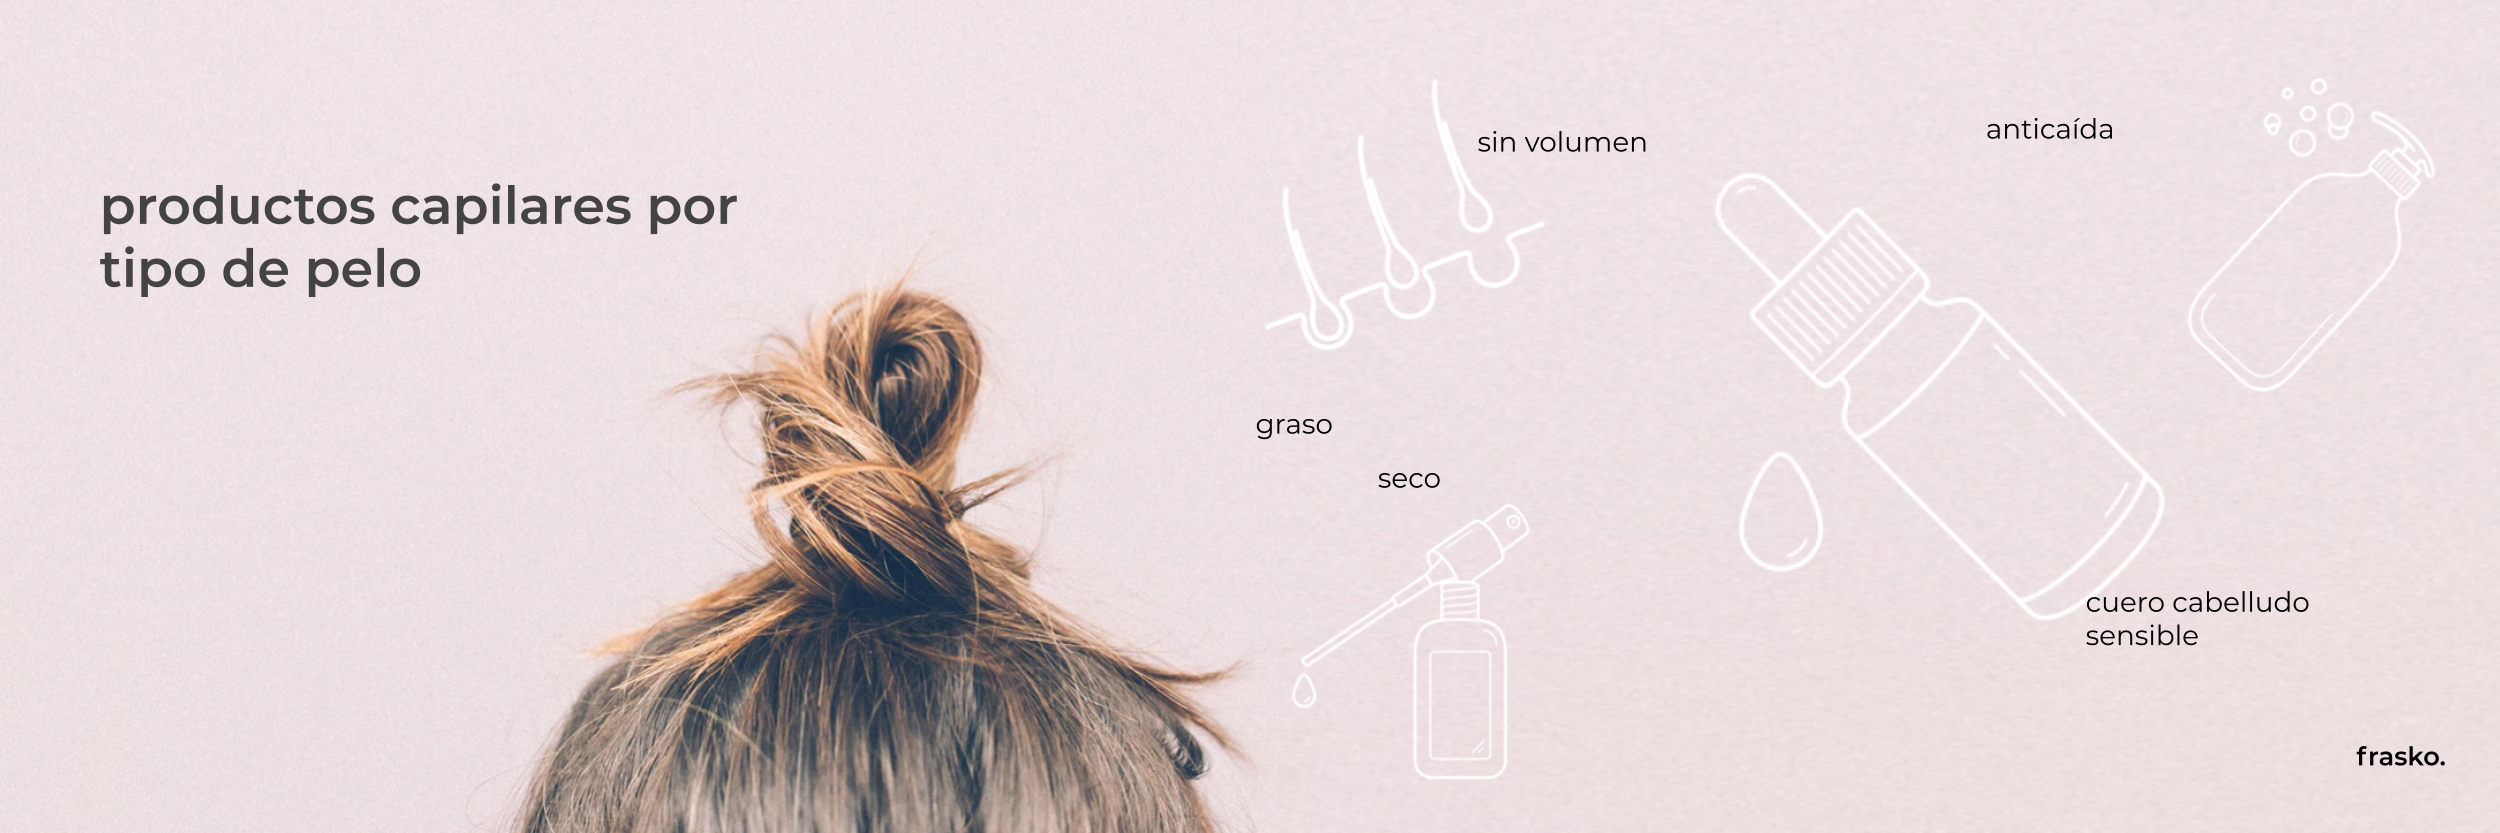 Cuidado capilar por tipo de pelo